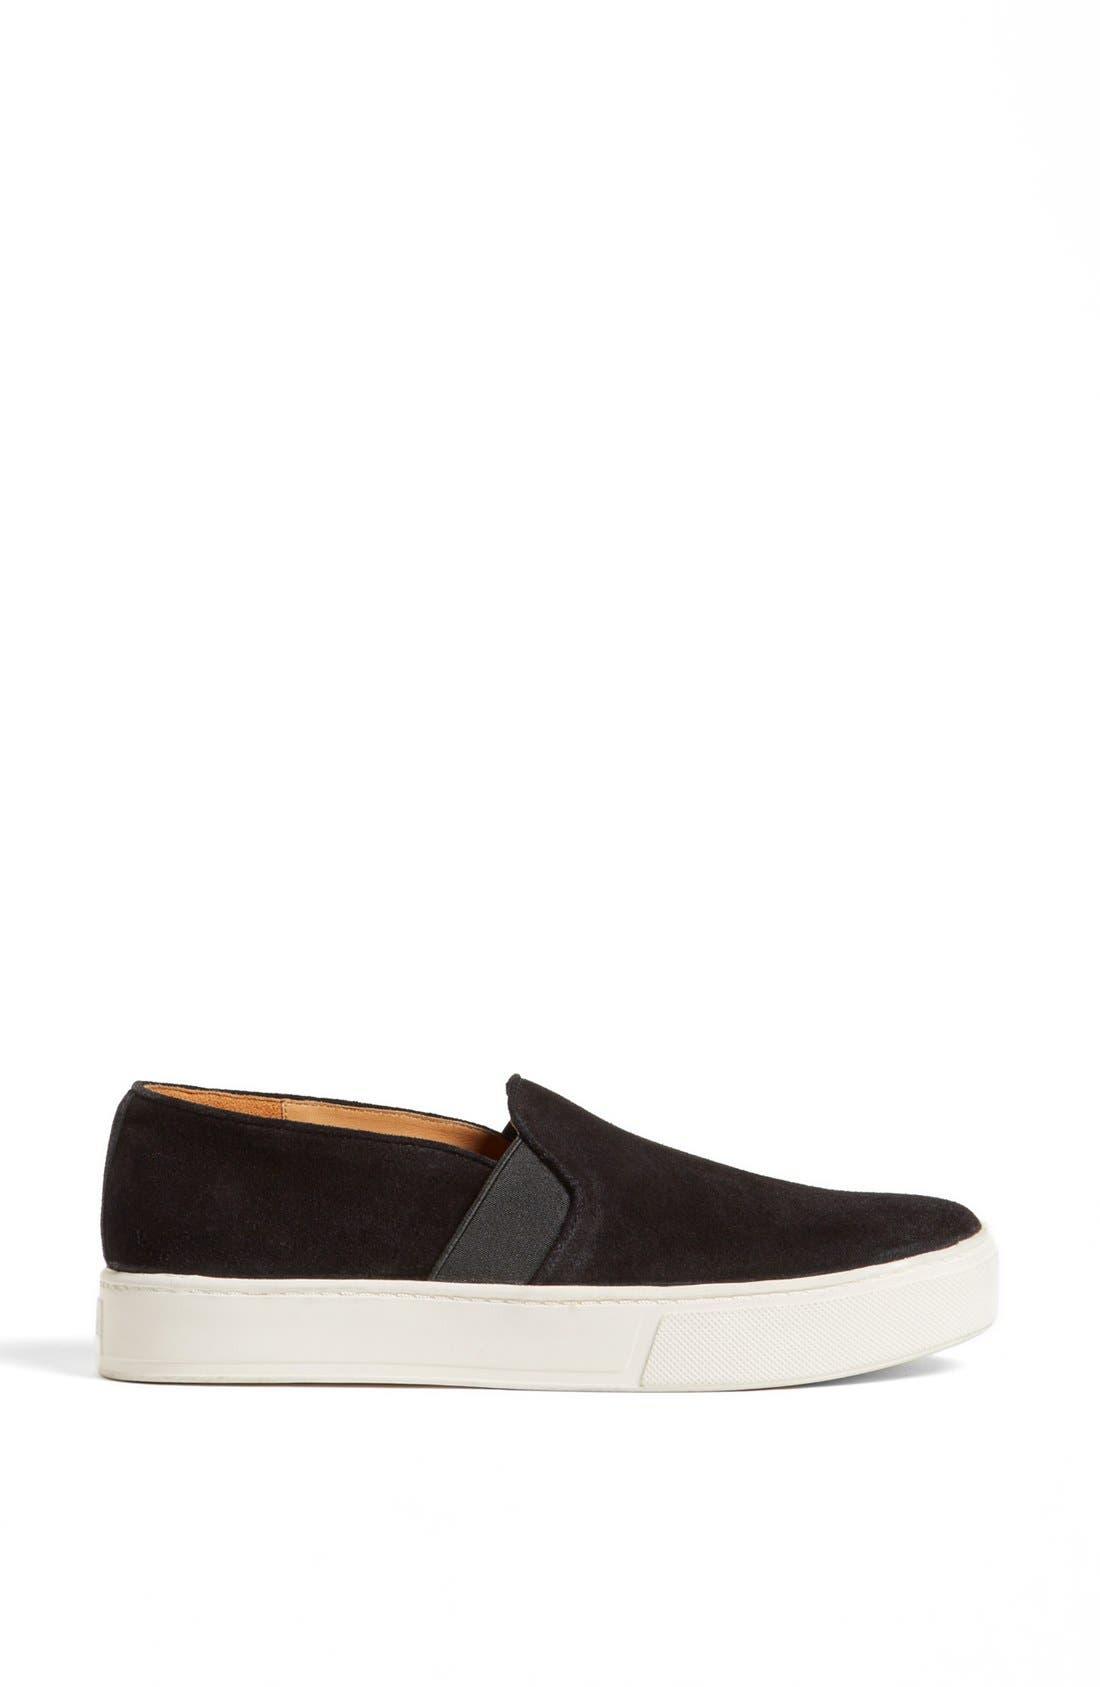 'Blair 3' Sneaker,                             Alternate thumbnail 4, color,                             Black